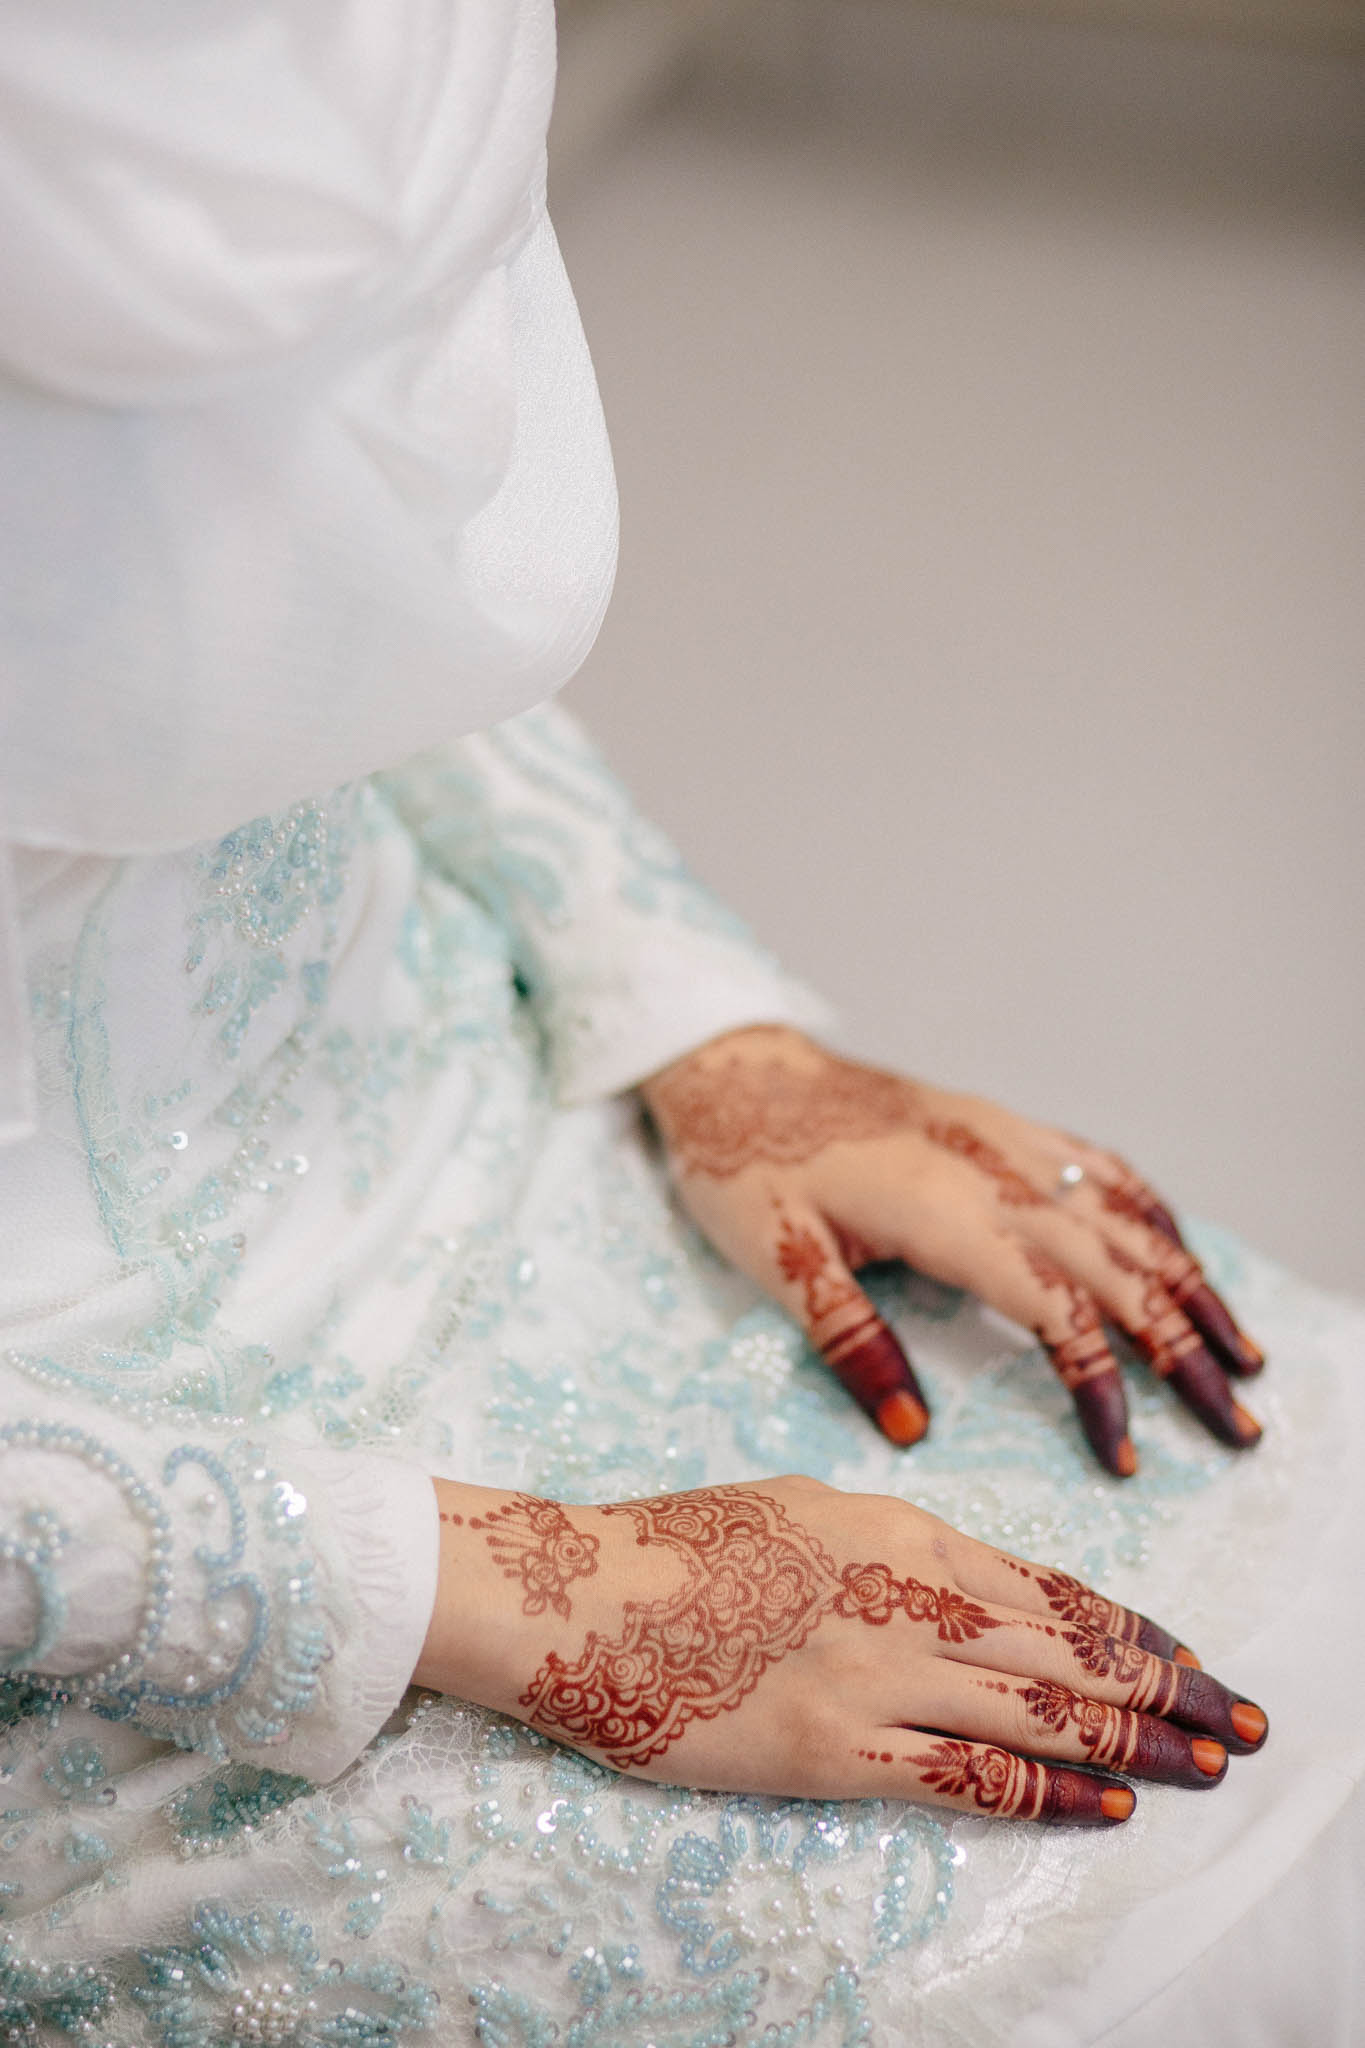 singapore-wedding-photographer-sharalyn-syazwan-005.jpg